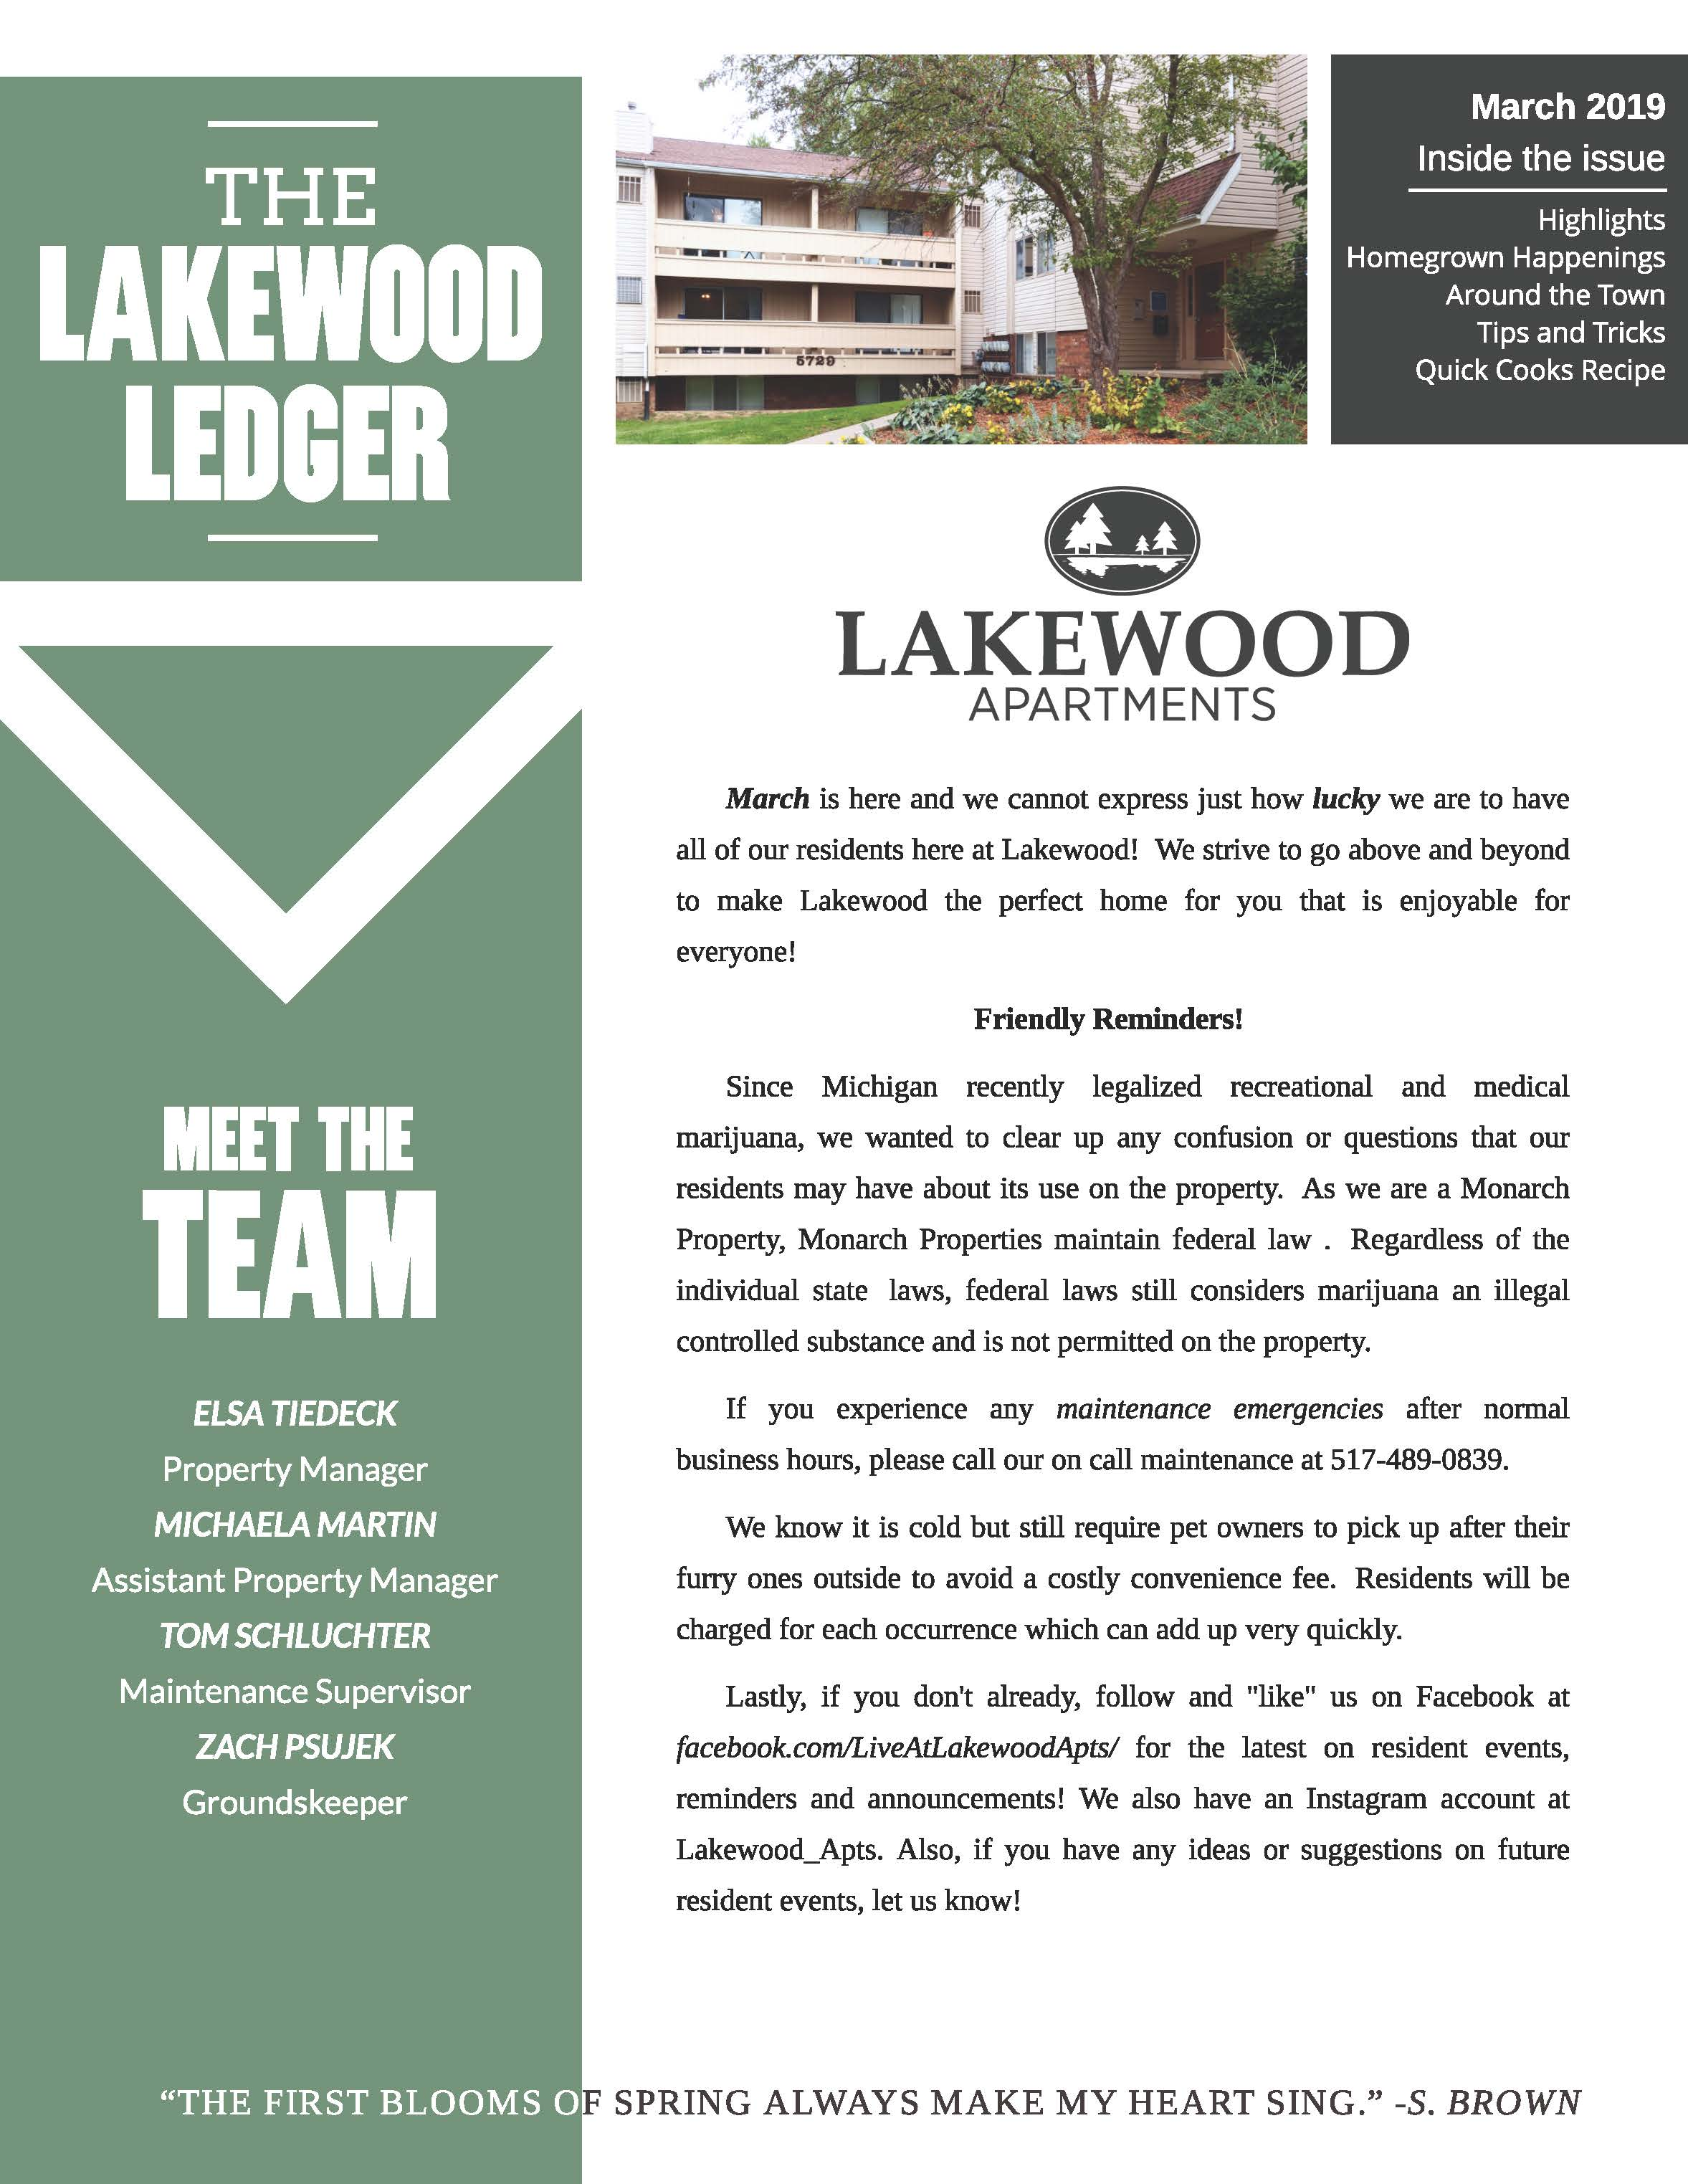 The Lakewood Apartments munity